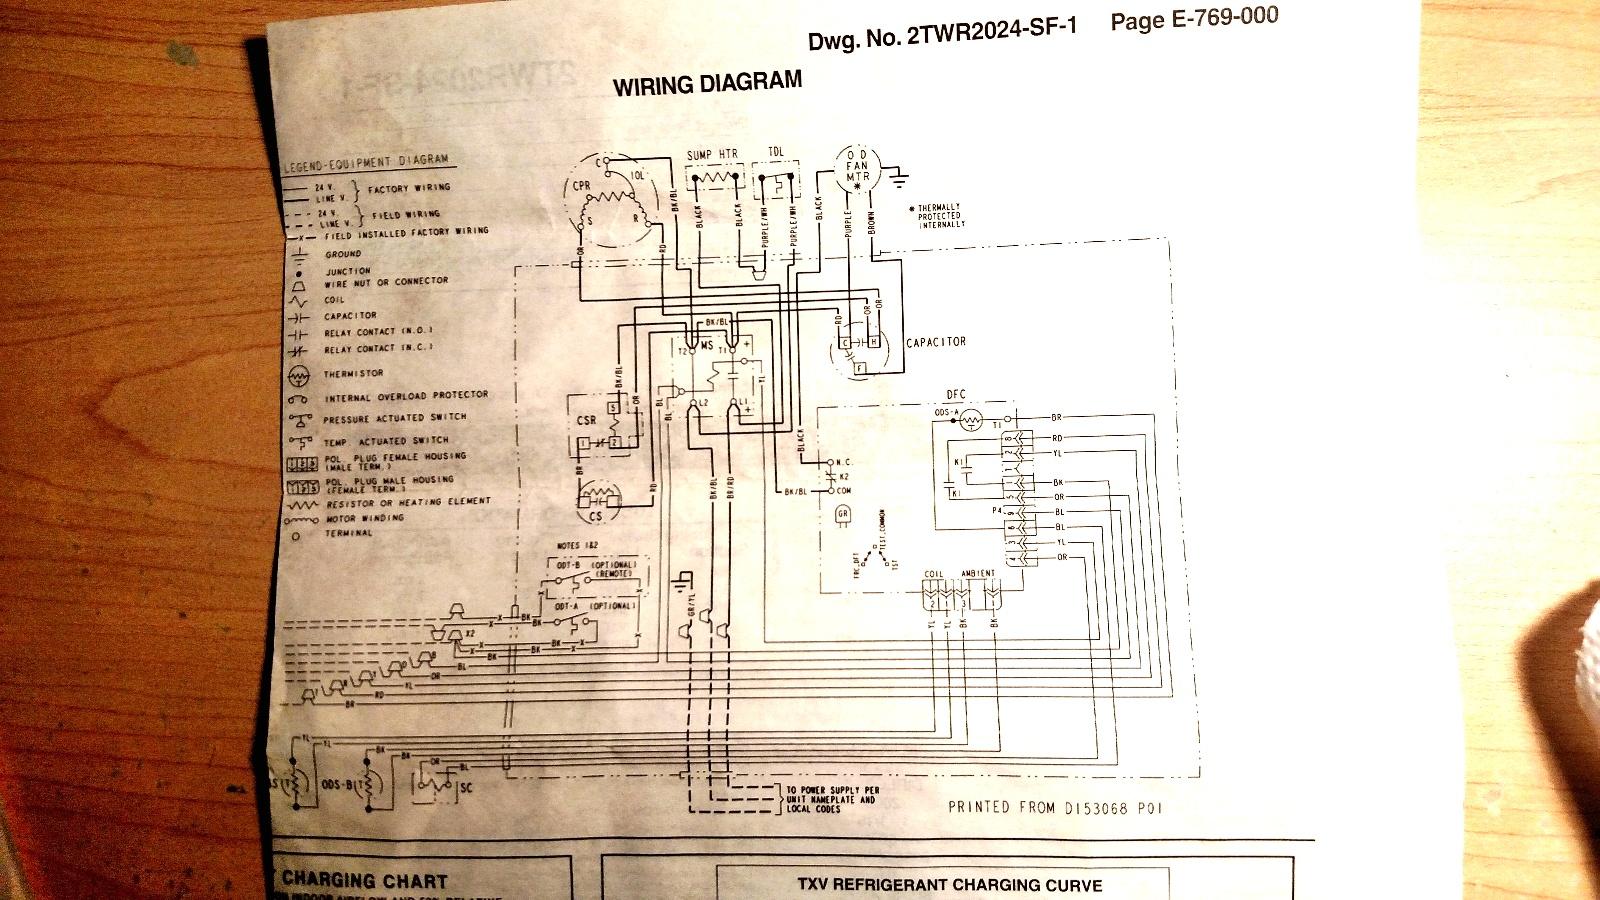 Wiring Diagram Goodman Aepf426016 Page 4 And Air Handler For Ar61 1 Magnetic Door Lock Schematics Source 2twr 2